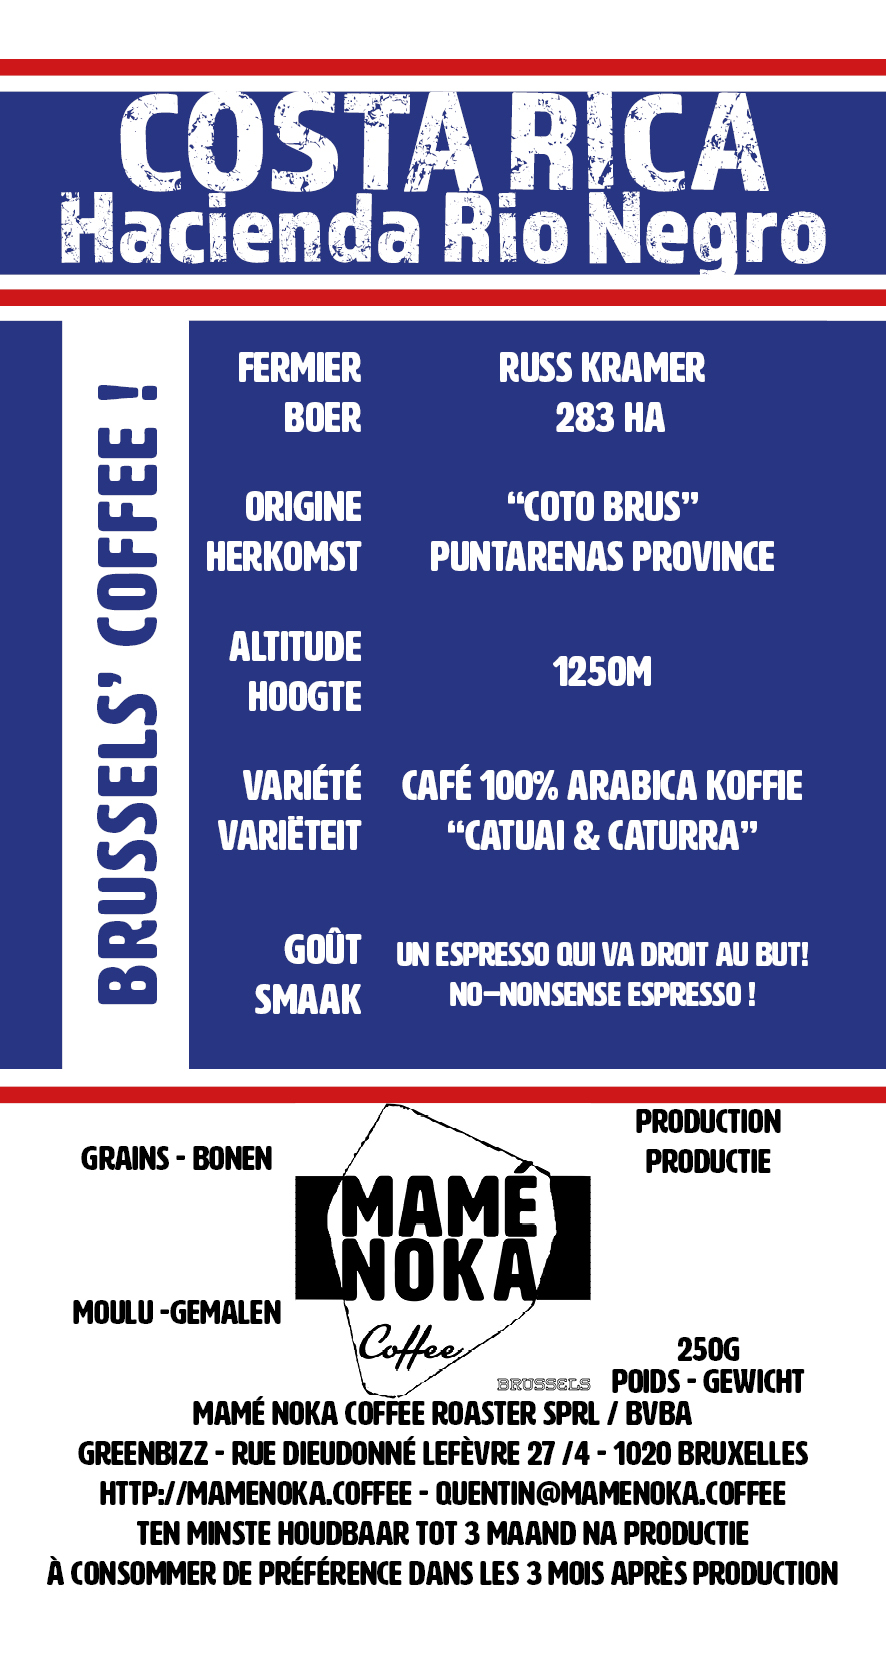 Mamé Noka Coffee Brussels - COSTA RICA- RIO NEGRO - 75x140 - 2017-05-19.jpg